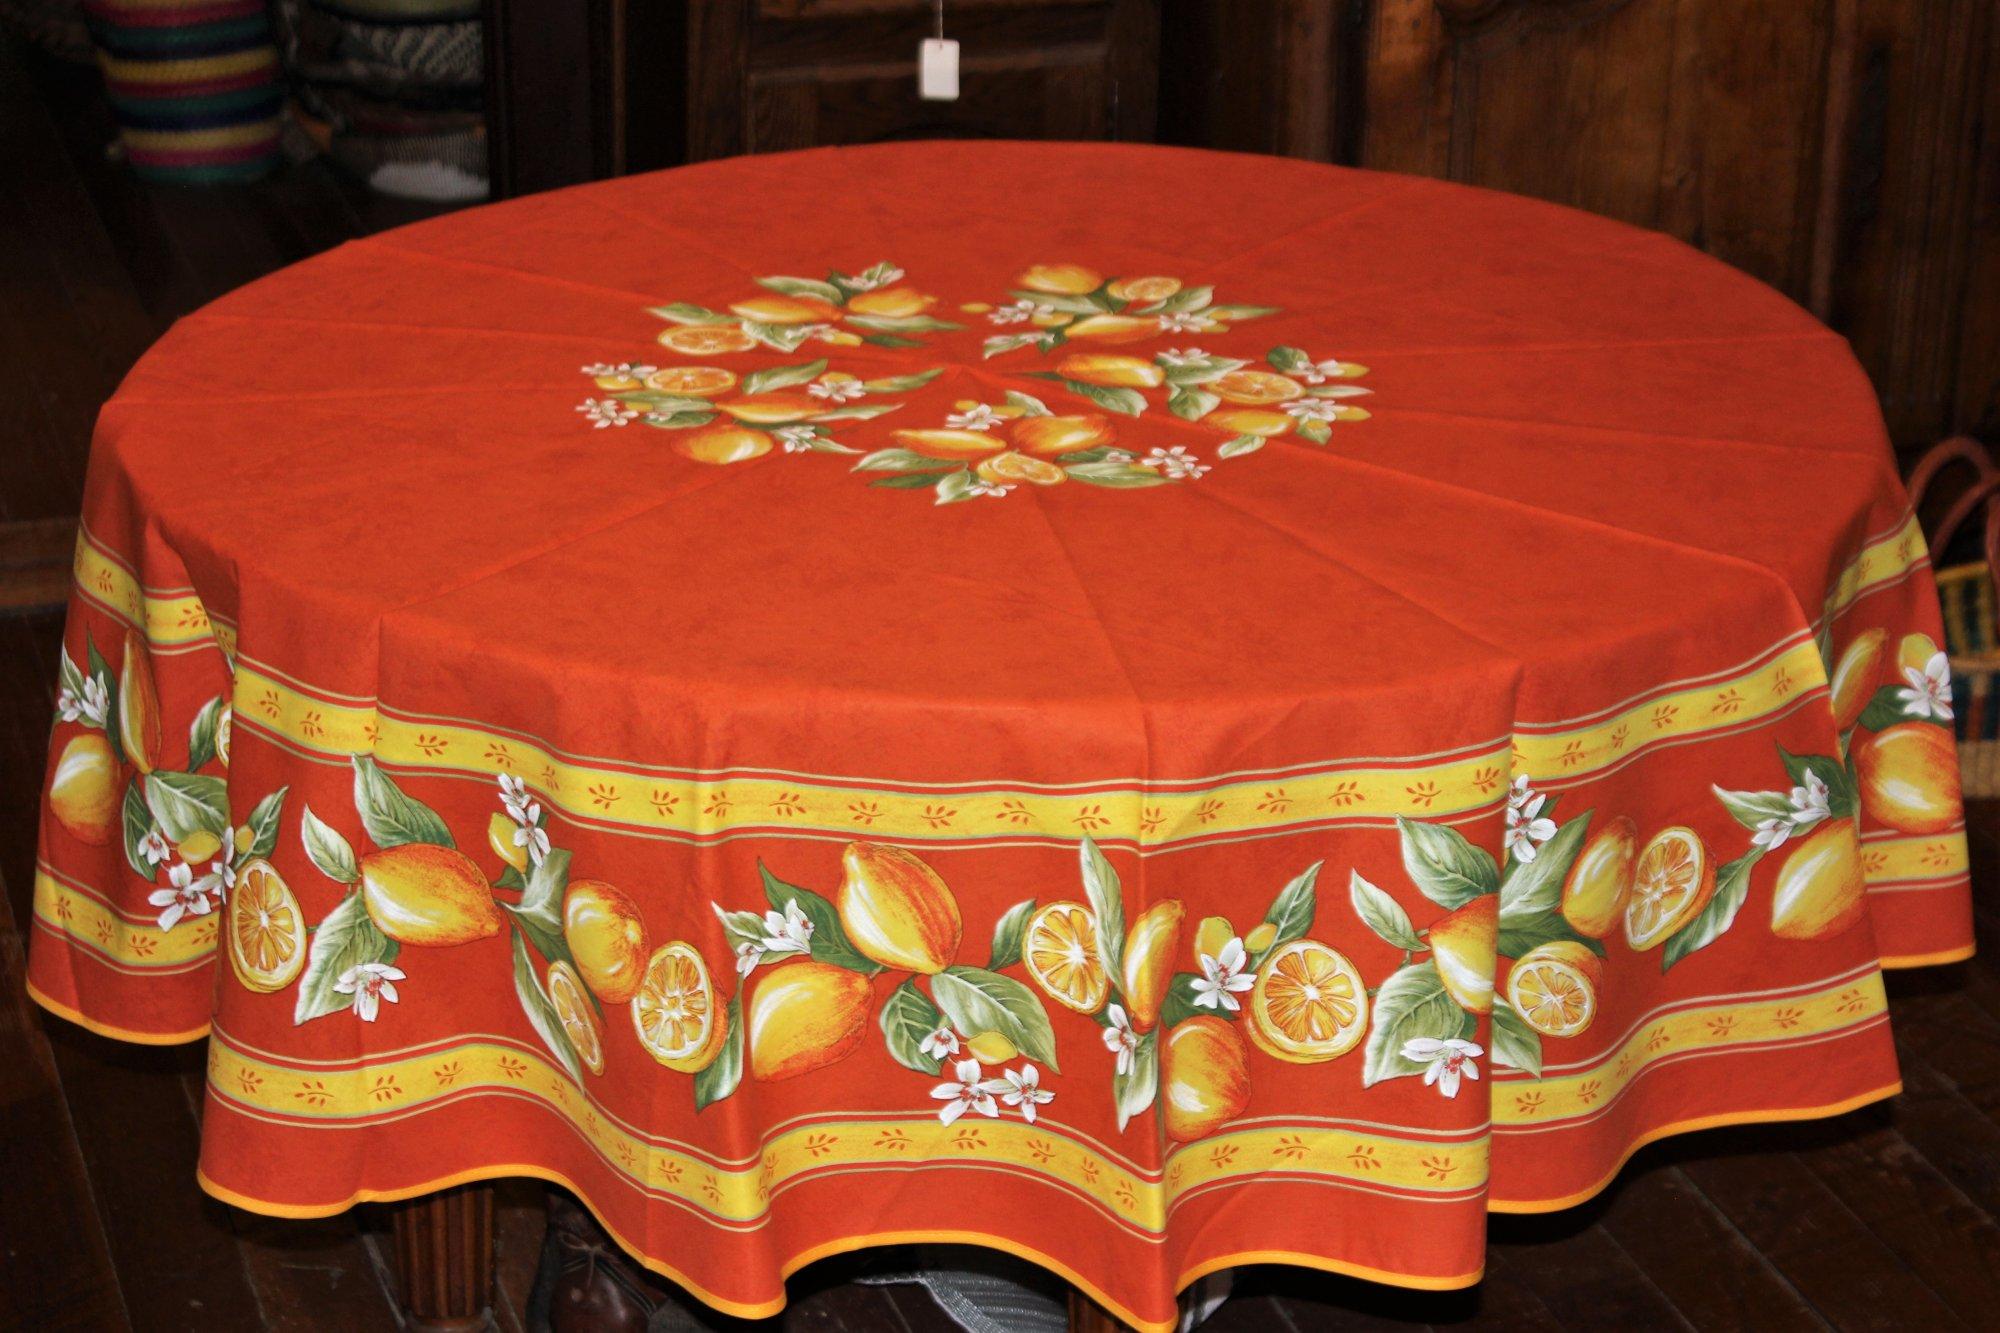 70 French Cotton Round Tablecloth Lemon (Orange)